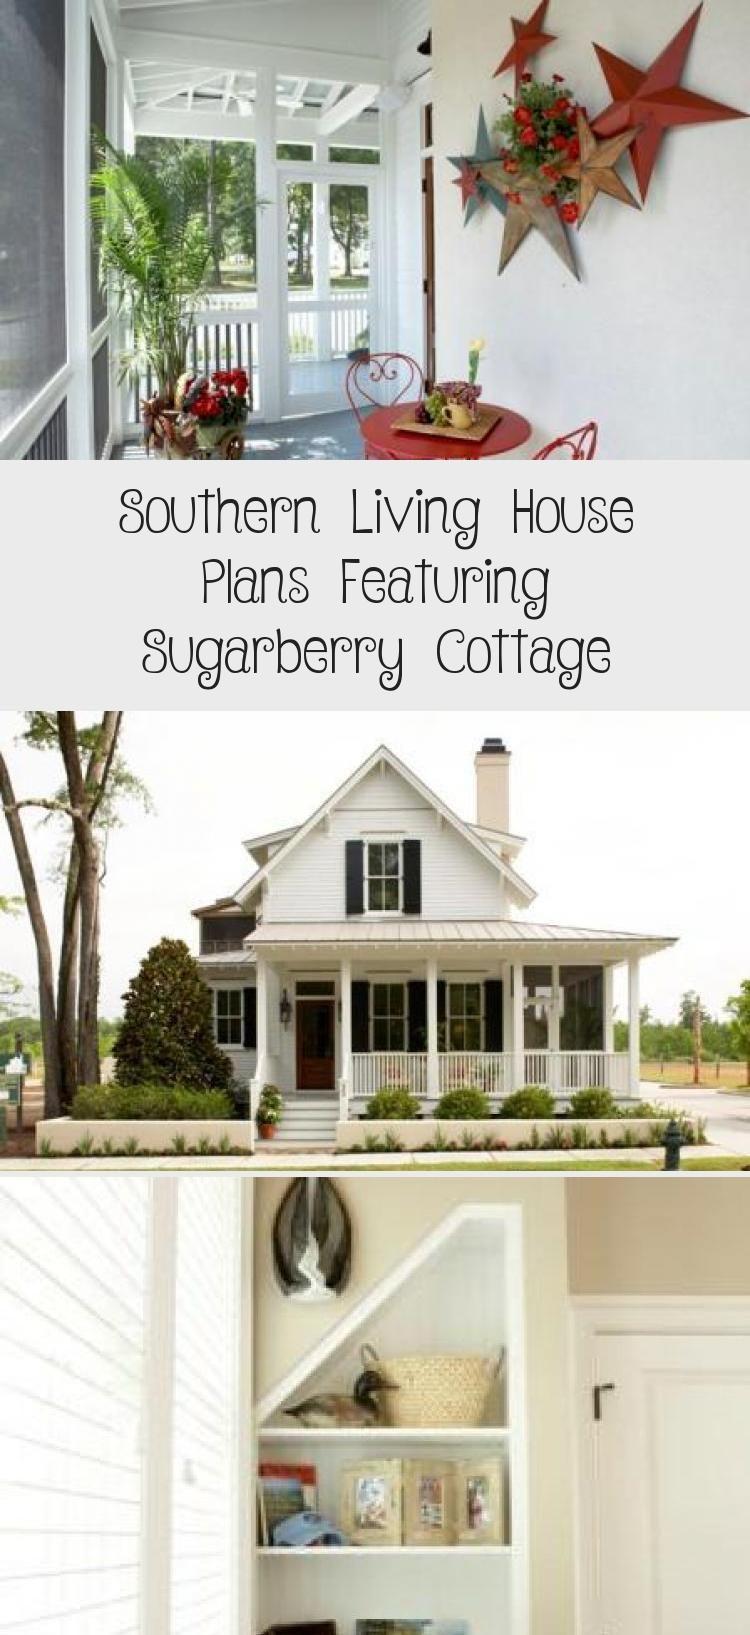 Tinyhouseplans10x20 Tinyhouseplanscabins Tinyhouseplanslshape Tinyhouseplans12x24 Tinyhouseplanst Southern Living House Plans Tiny House Plans House Plans